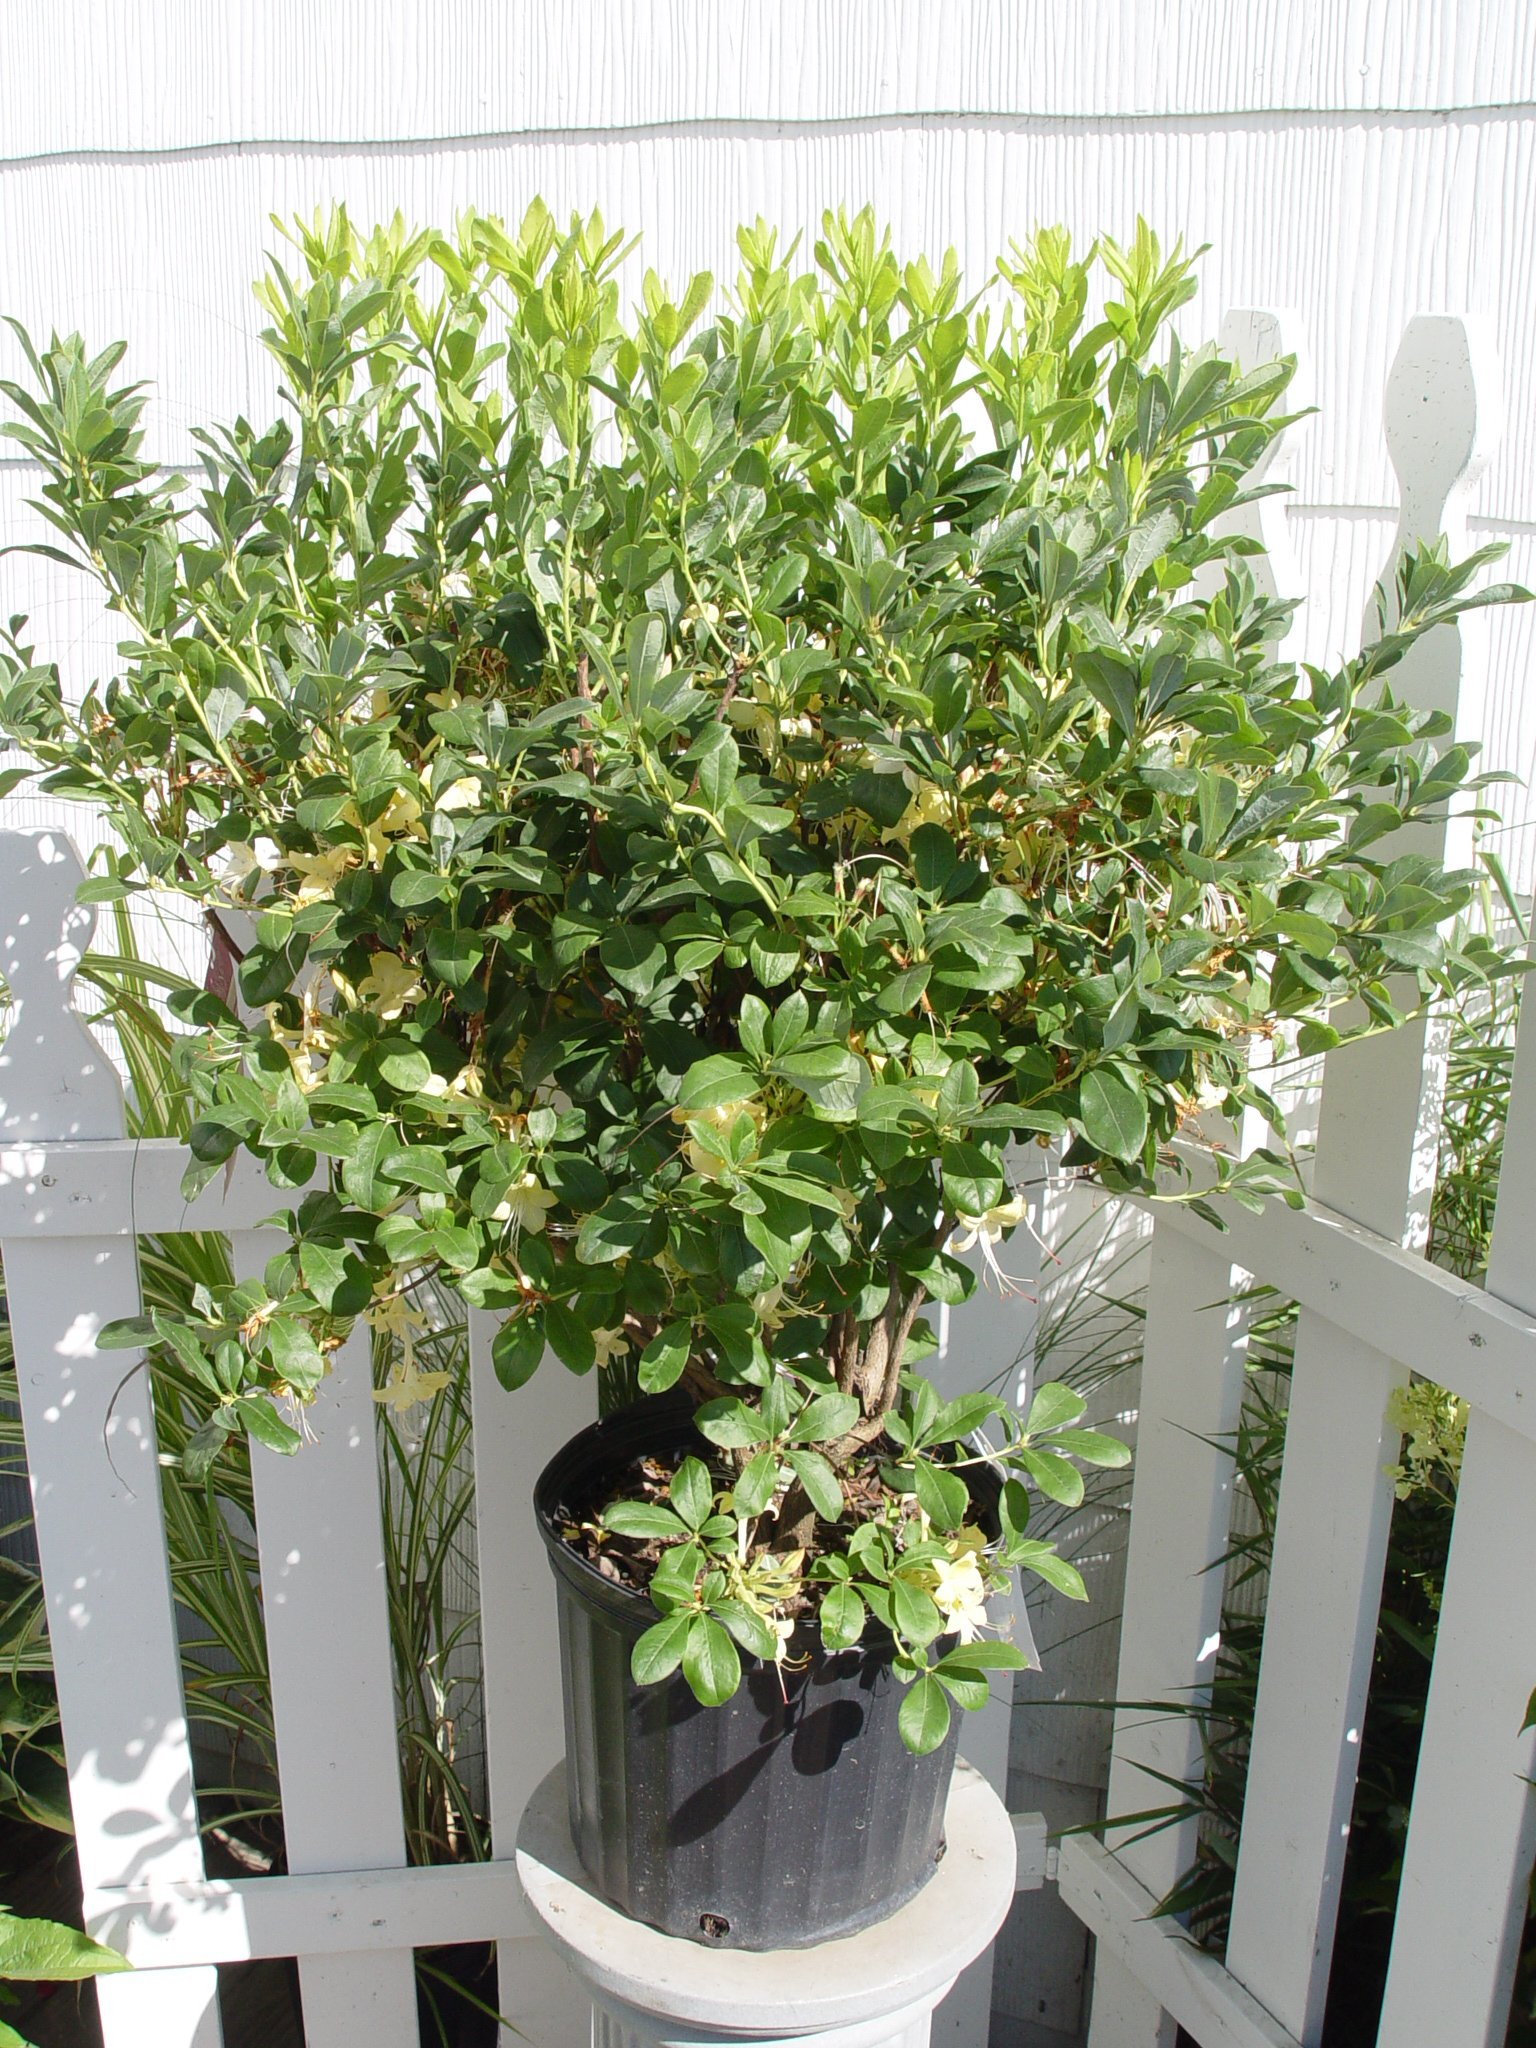 Azalea 'Lemon Drop' (Swamp Azalea) Shrub, pale yellow flowers, #3 - Size Container